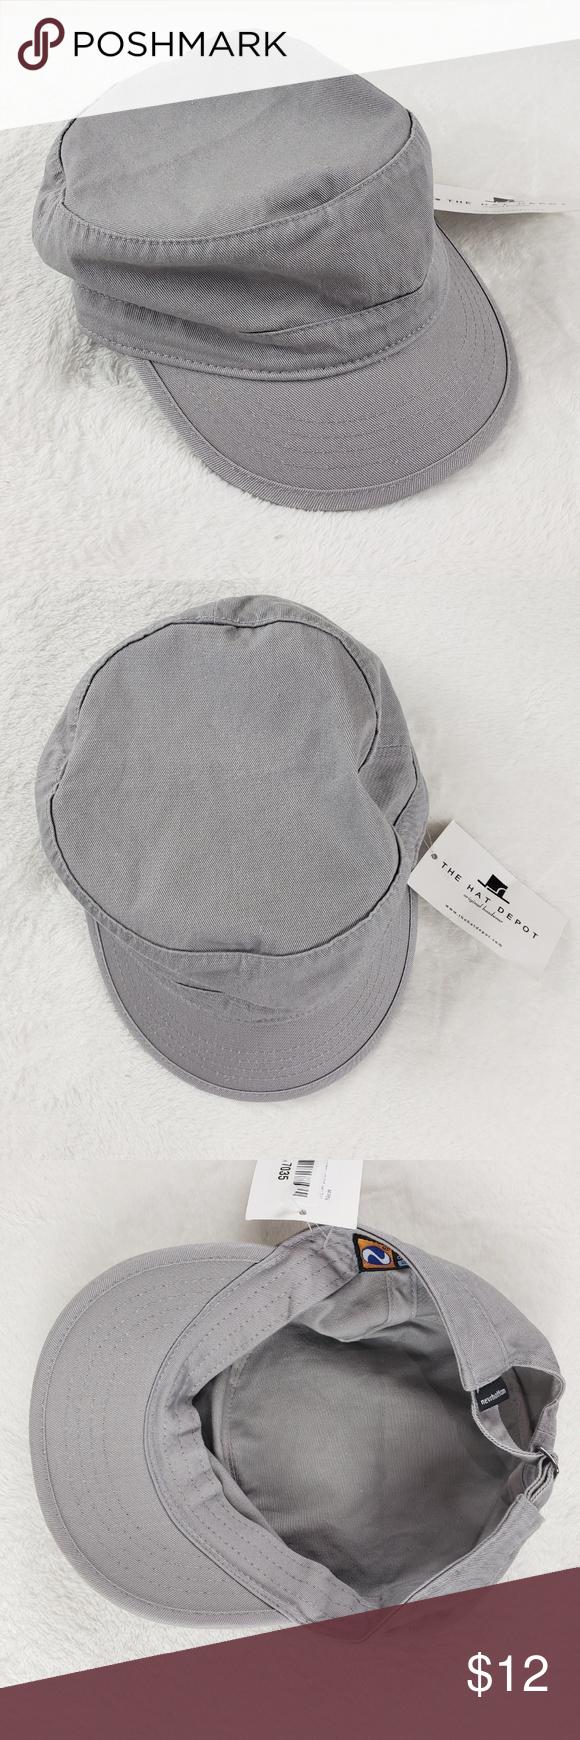 Charcoal Denim Hat Cap NEWHATTAN New